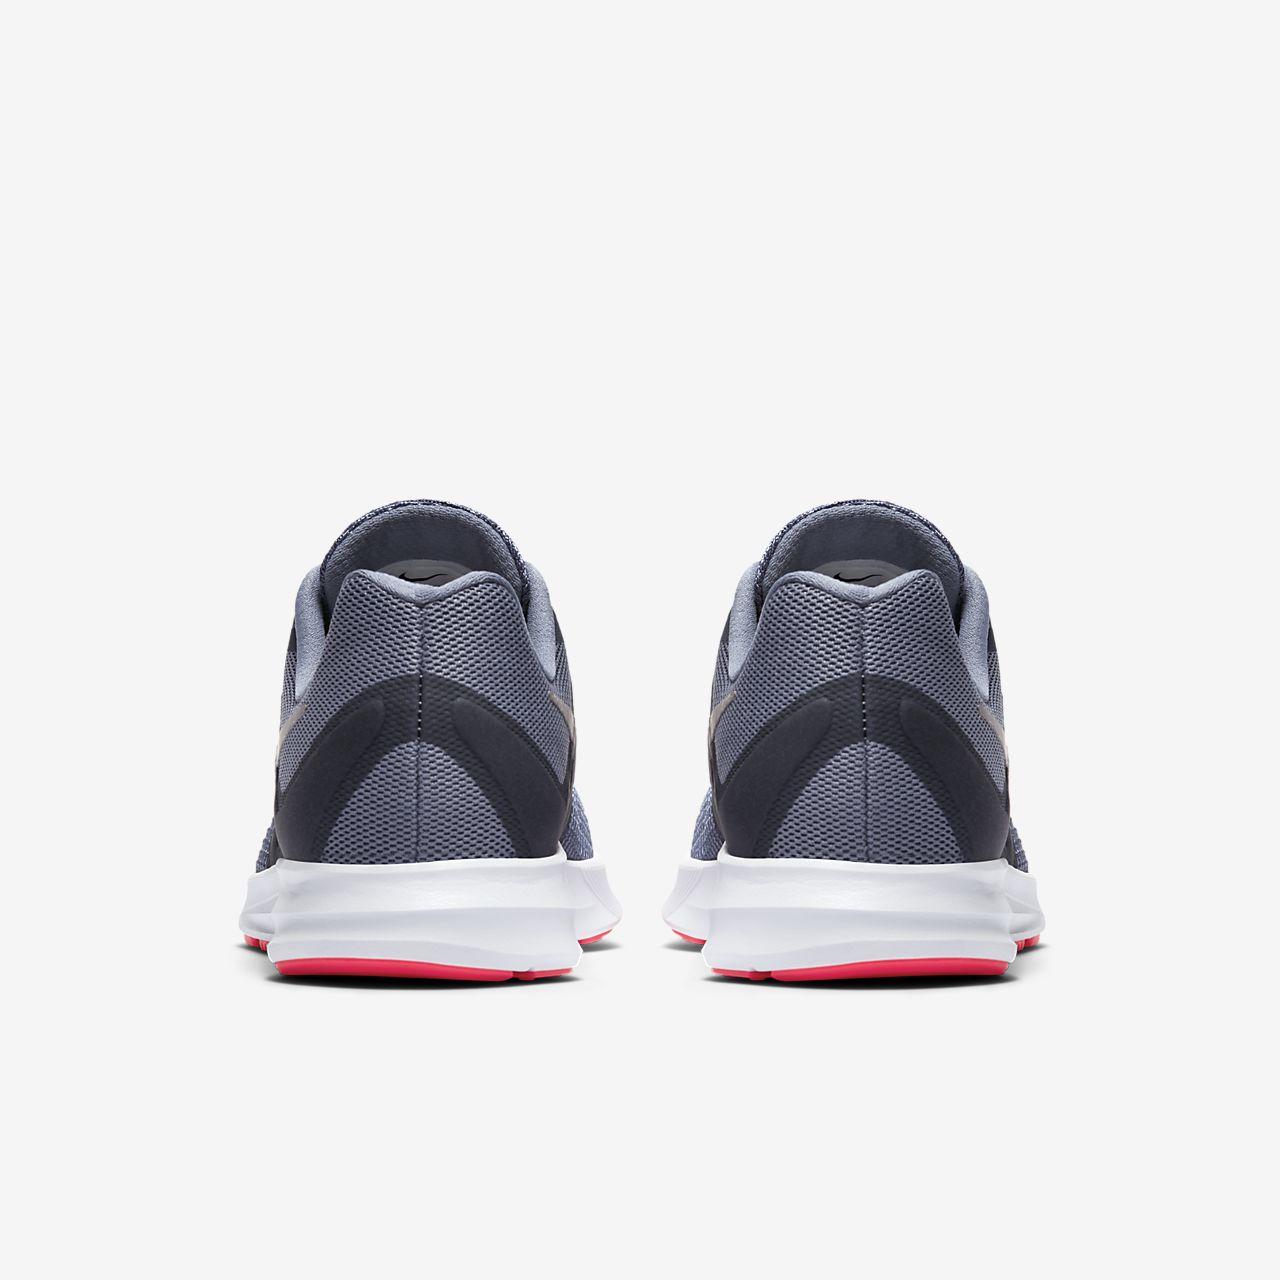 sports shoes c2e55 8d4b3 ... Calzado de running para niños talla grande Nike Downshifter 7